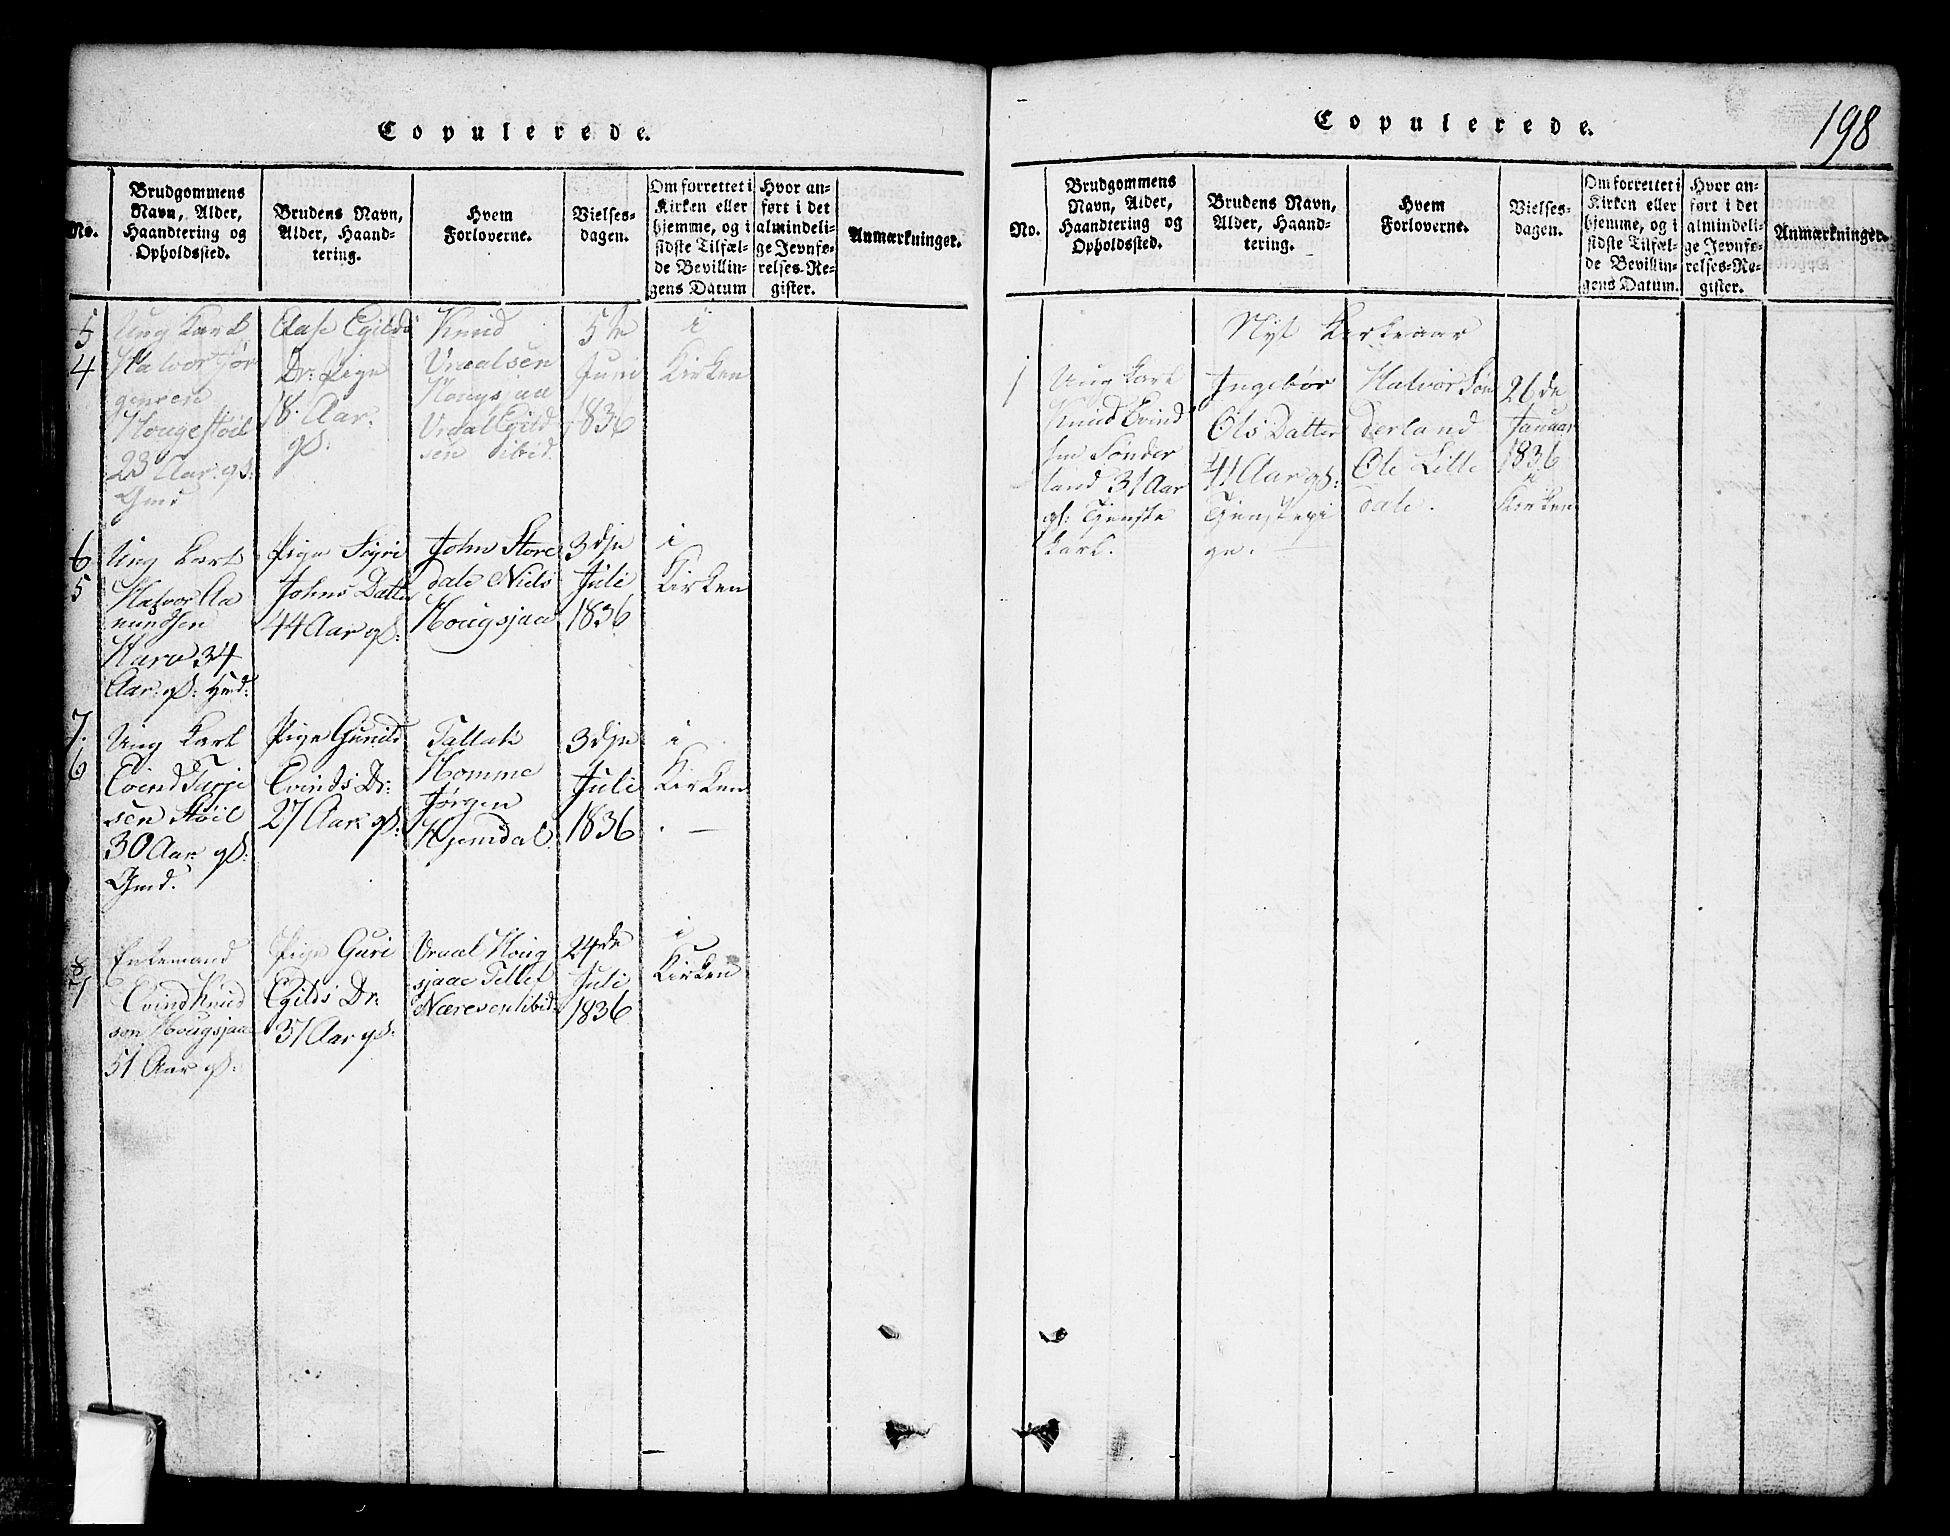 SAKO, Nissedal kirkebøker, G/Gb/L0001: Klokkerbok nr. II 1, 1814-1862, s. 198